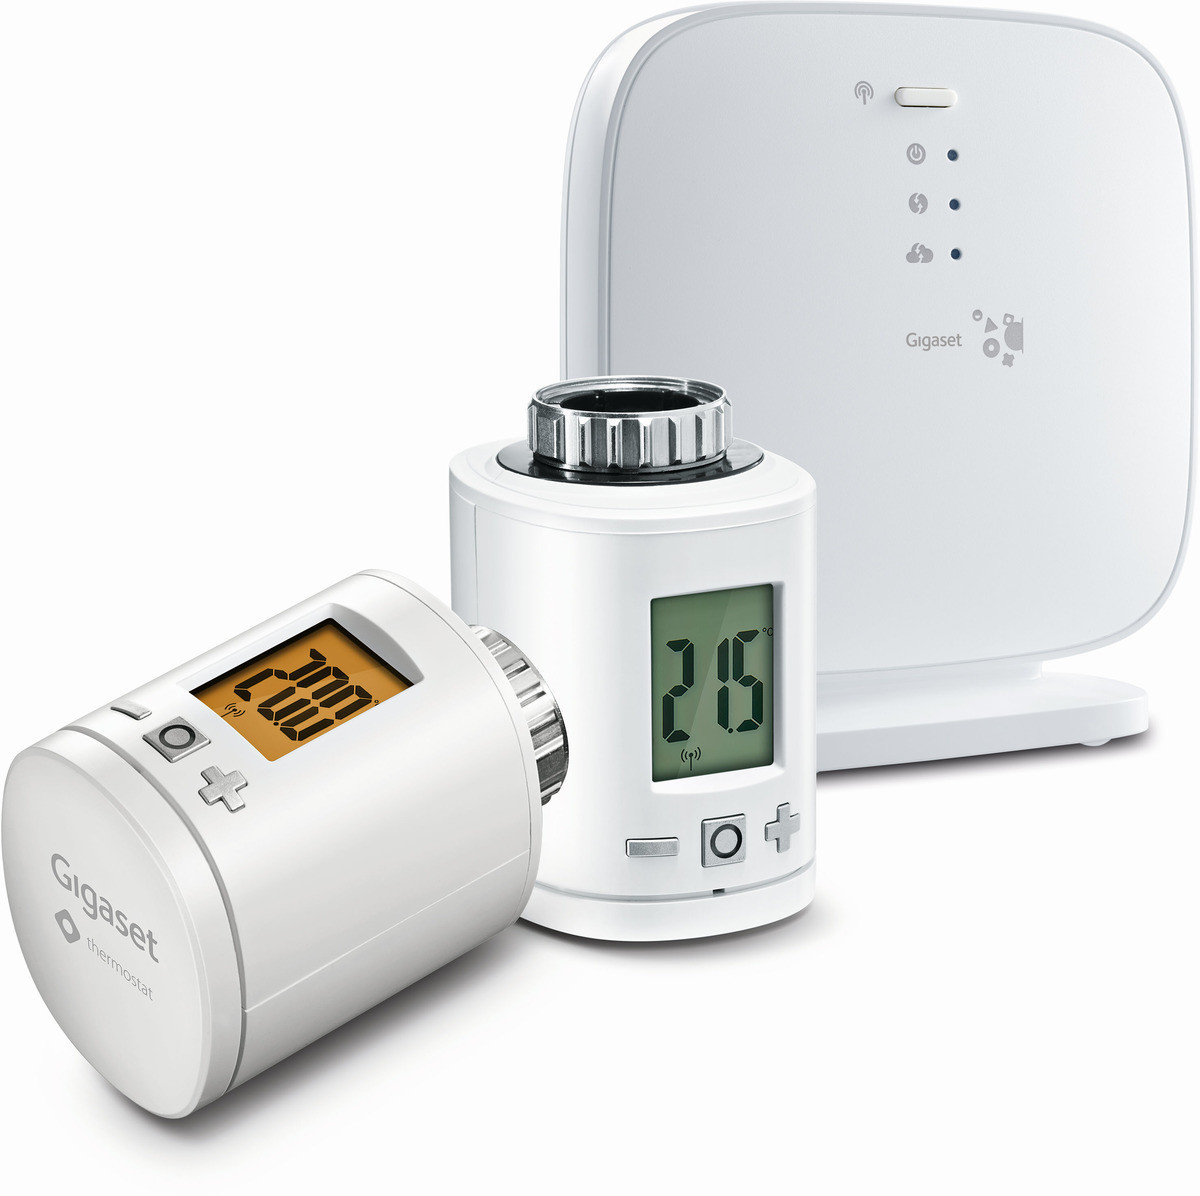 Gigaset elements Heating Pack (1x Gigaset Base + 2x Thermostat)